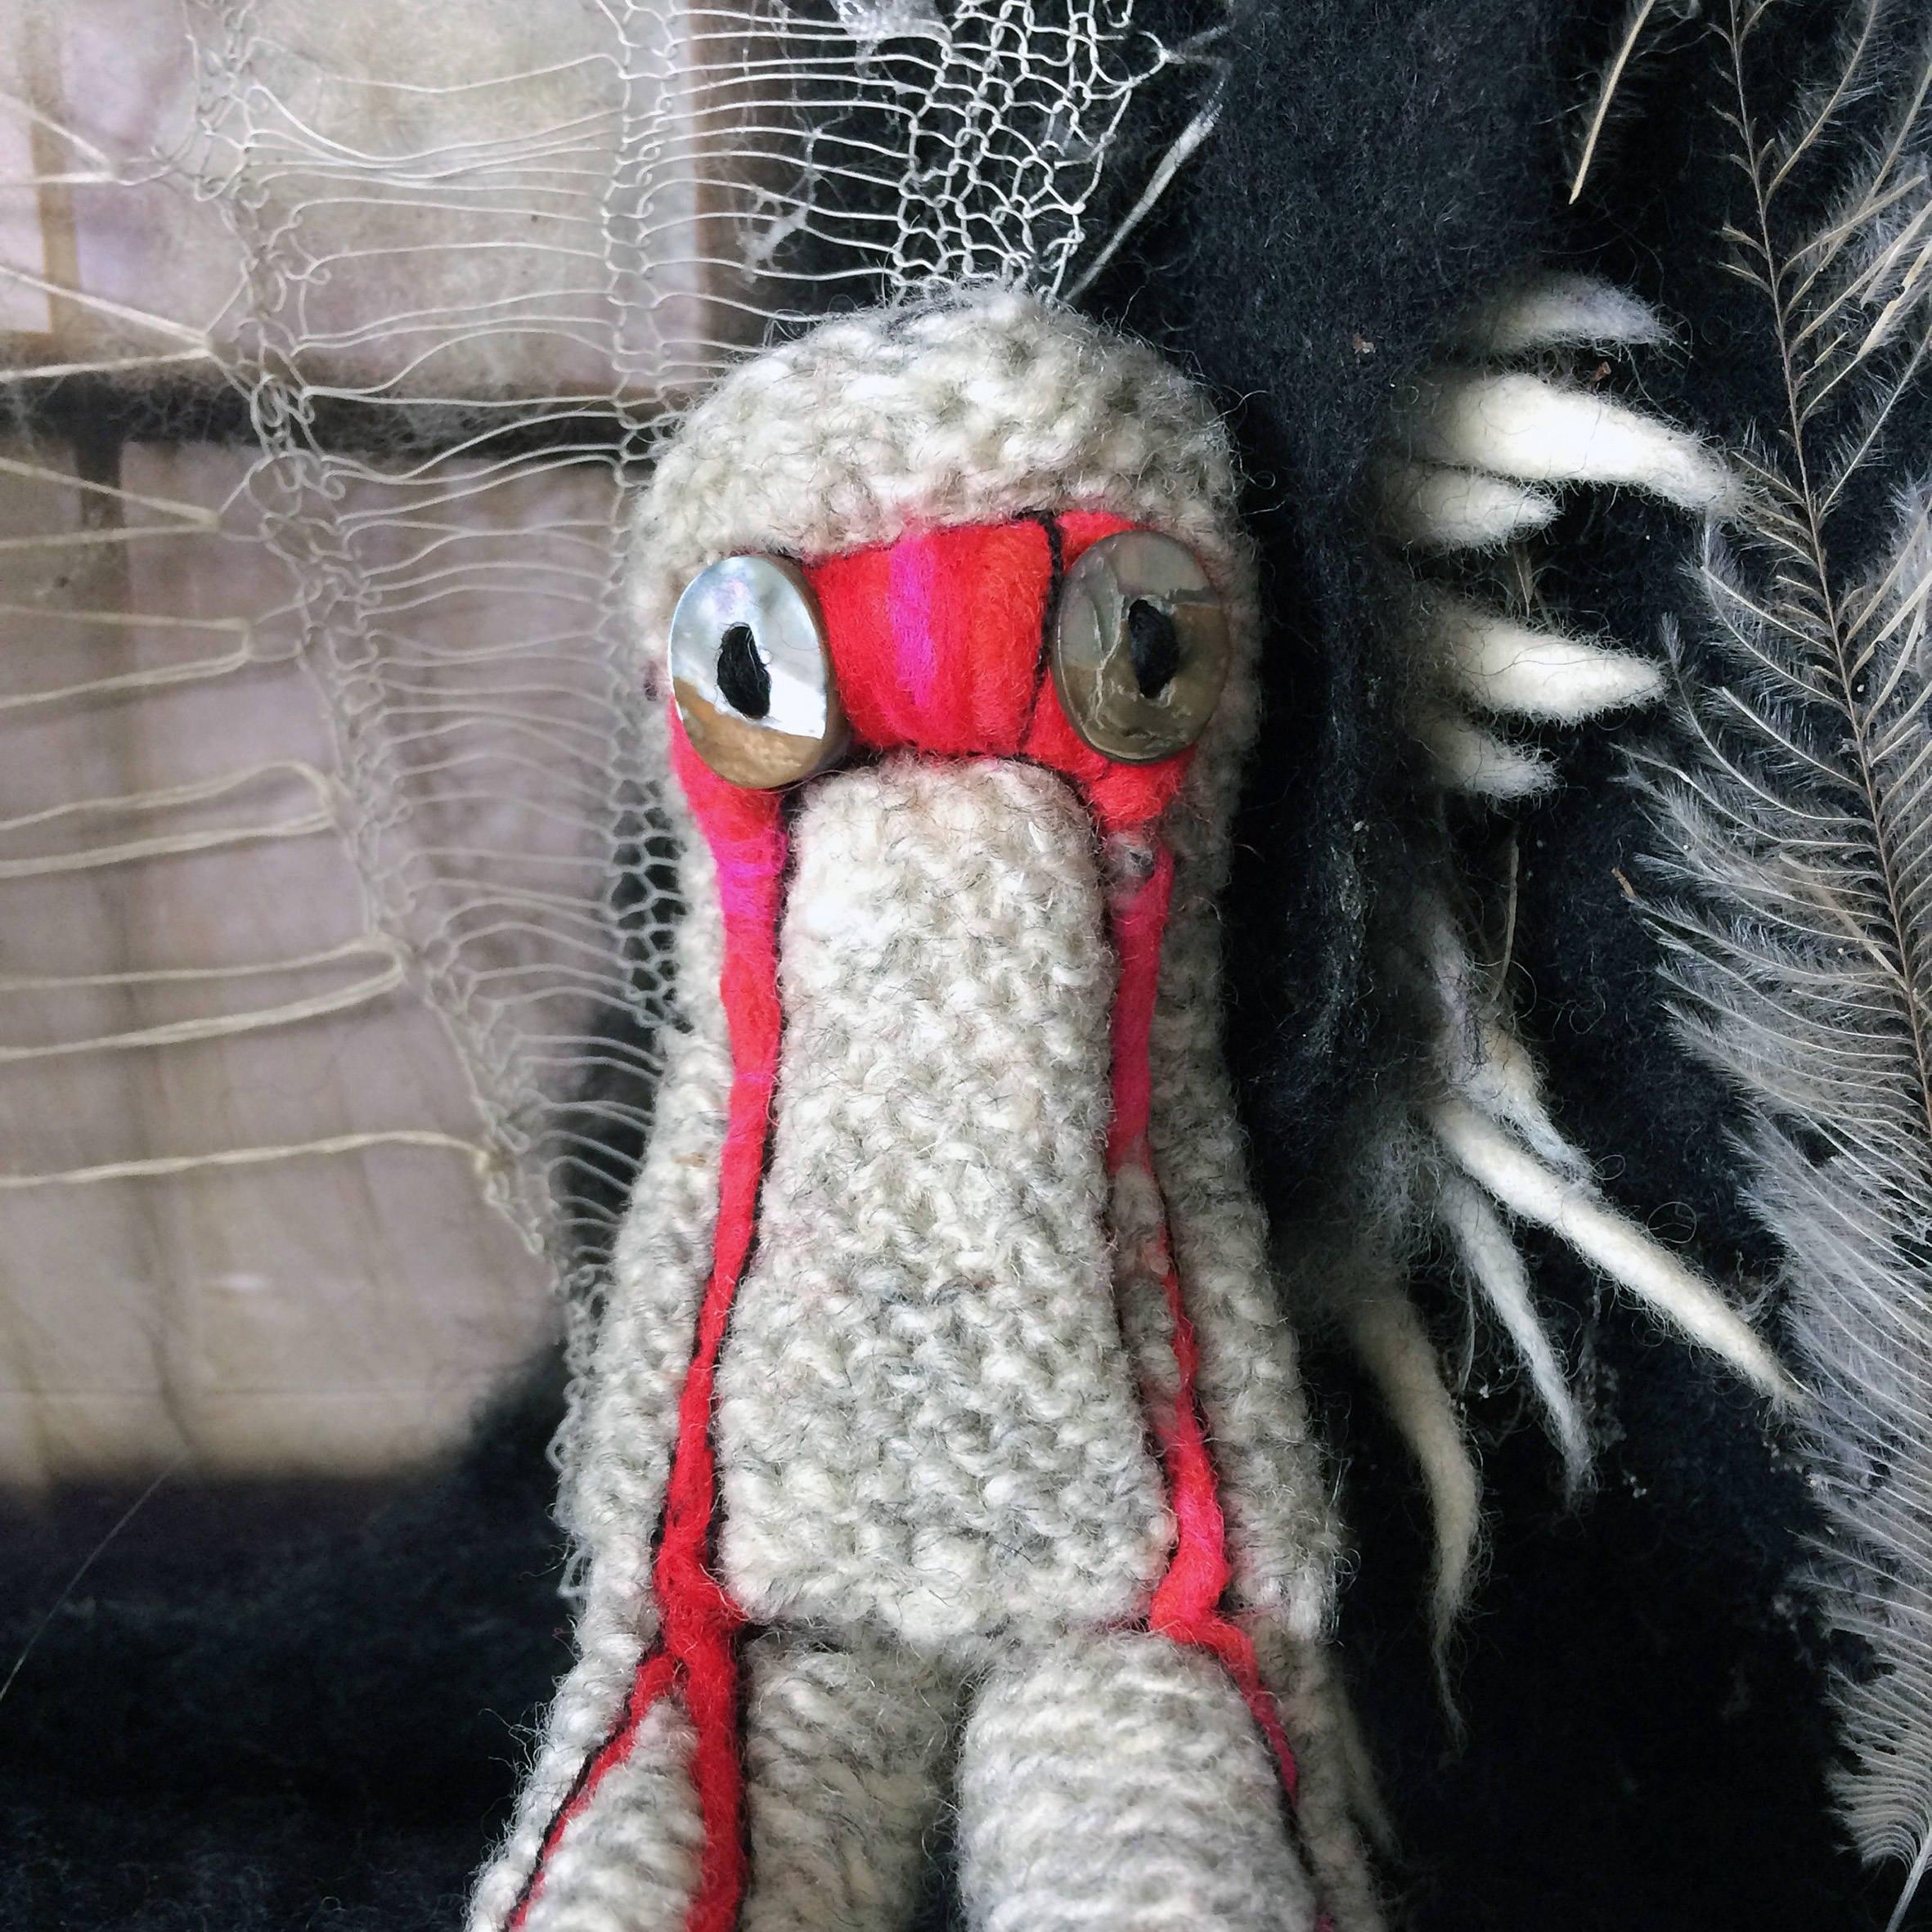 Blood Creature Creepy Cute Macabre Oddity Art Doll Horror Art Decor Soft Sculpture Art Textile